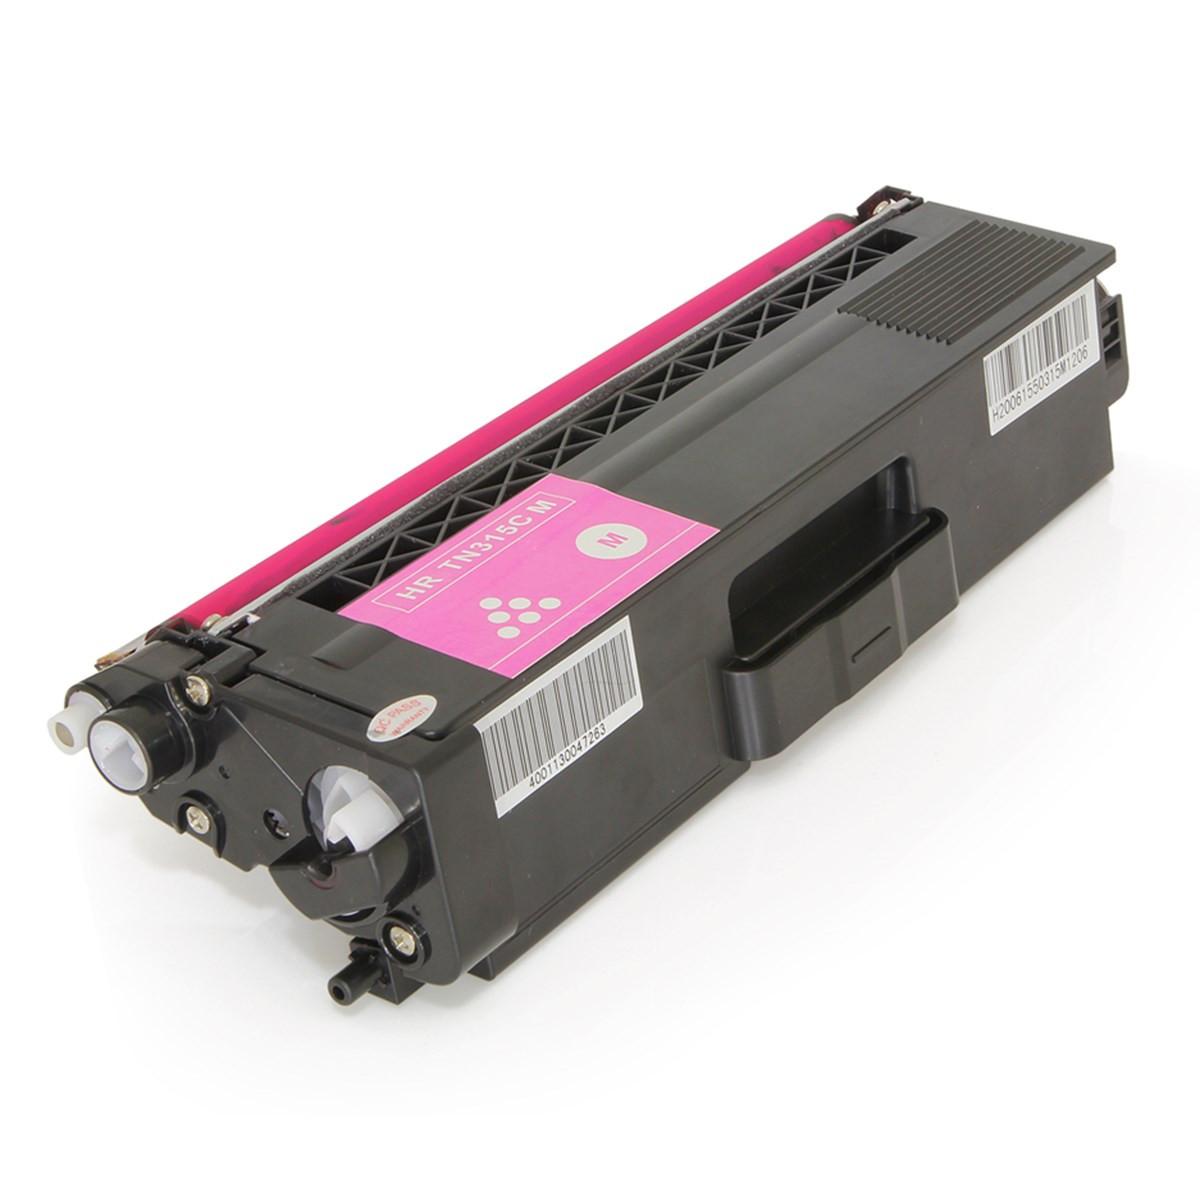 Toner Compatível com Brother TN315 TN315M Magenta | HL4150 MFC9460 HL4140 MFC9970 | Premium 1.5k